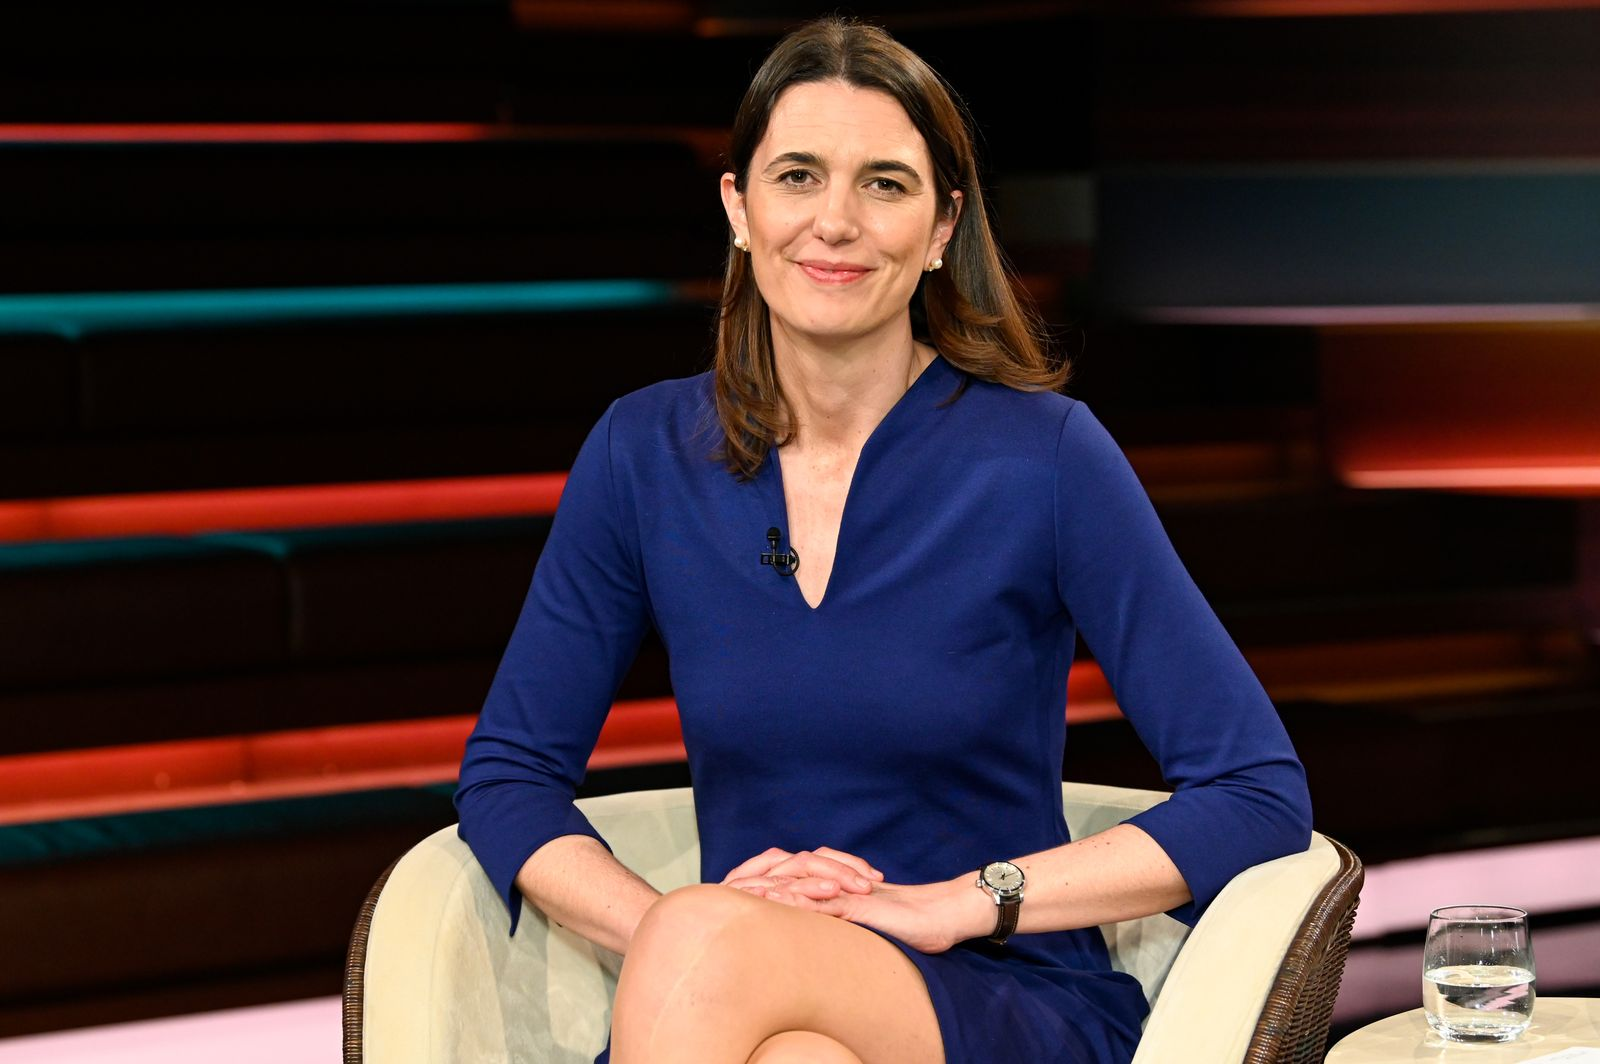 Melanie Brinckmann